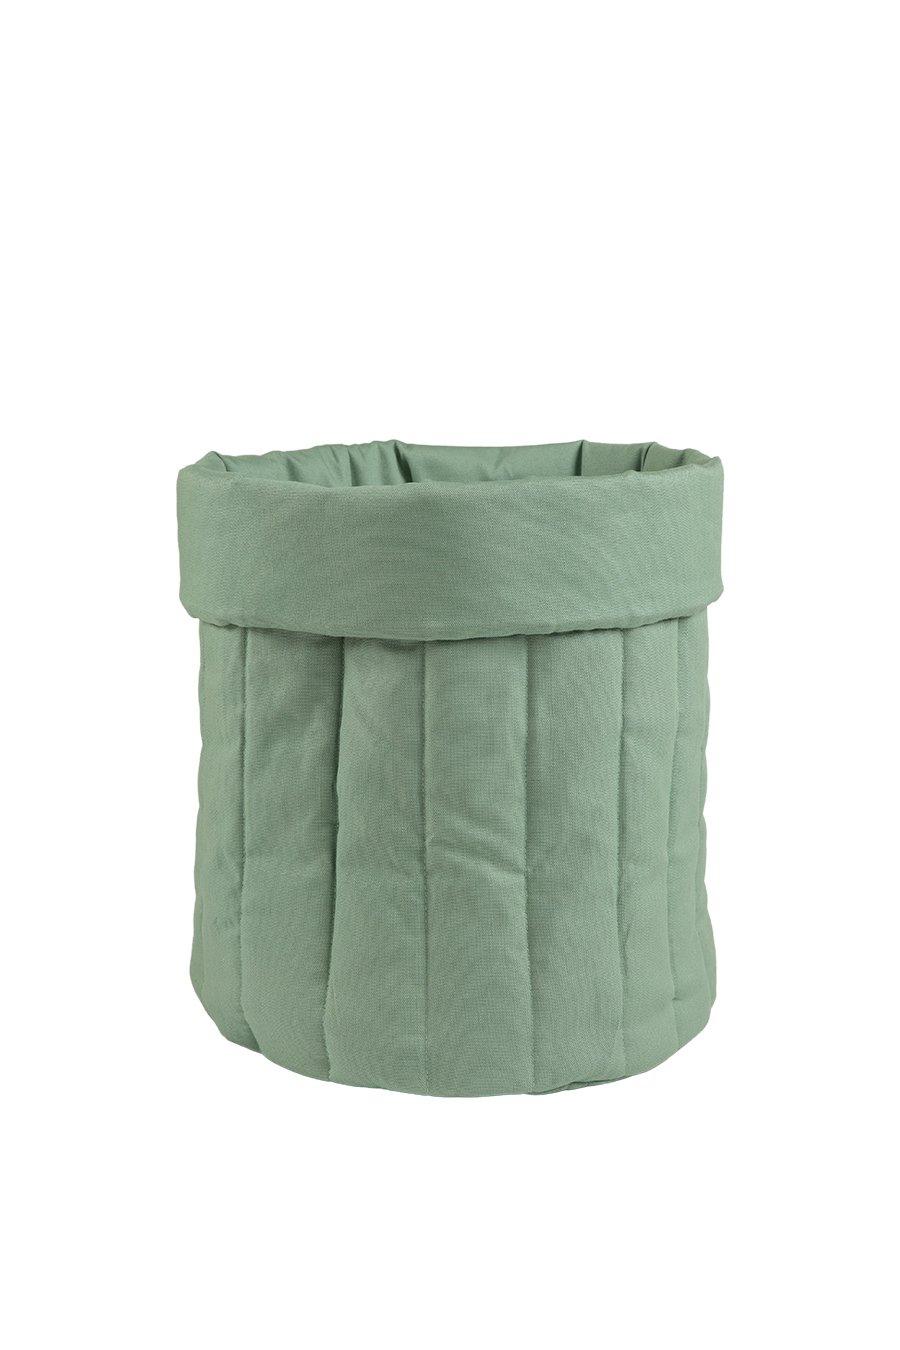 wigiwama PLAIN OLIVE GREEN TOY BAG